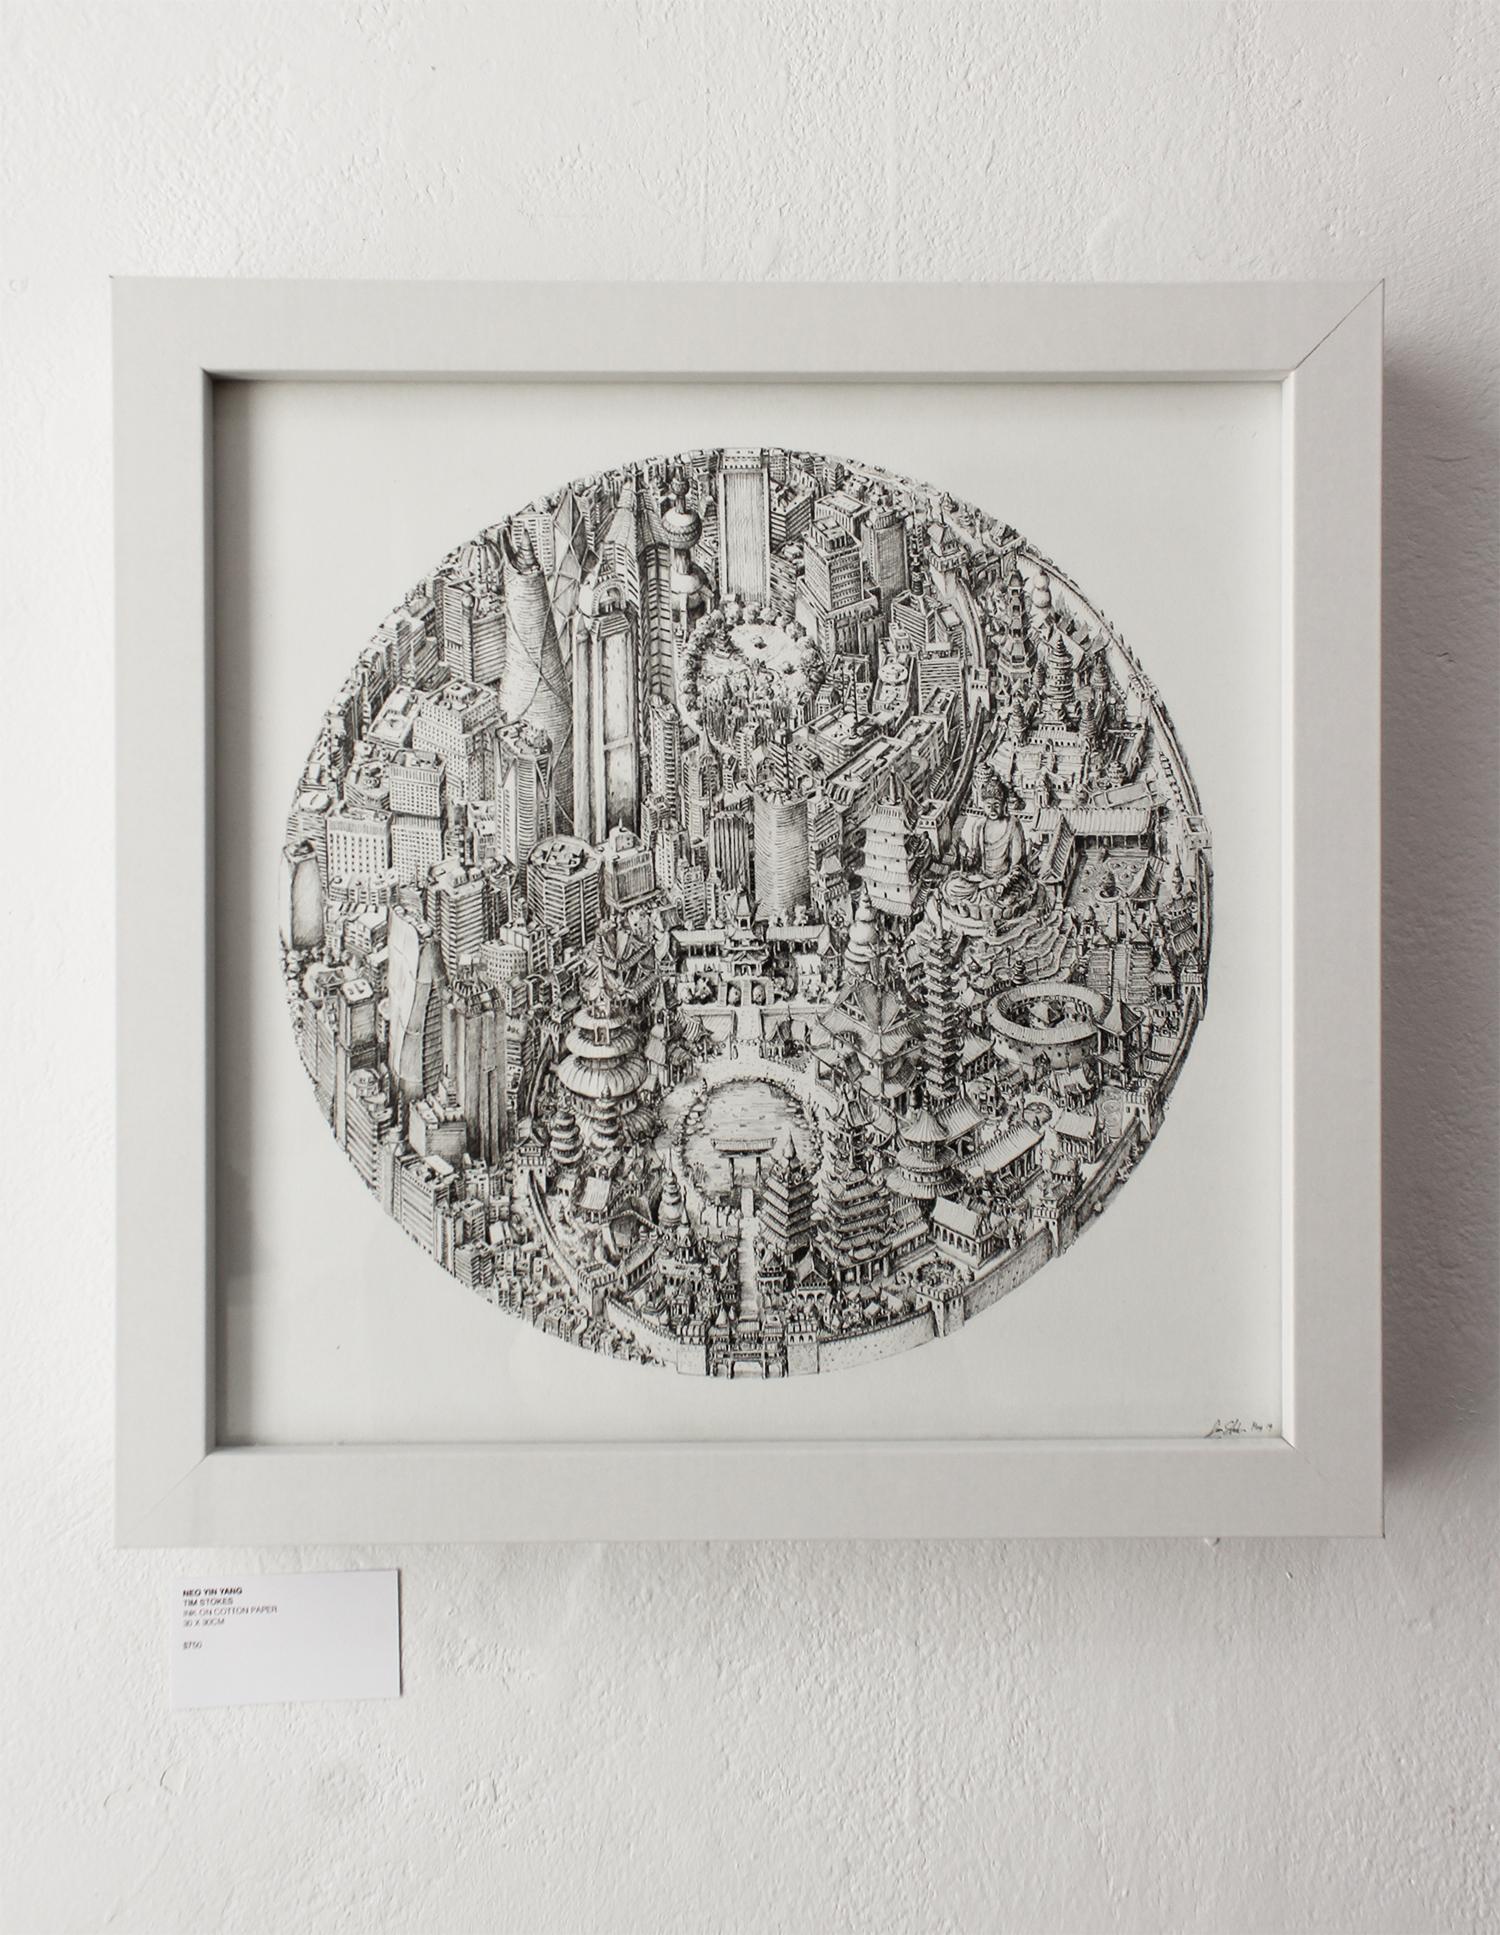 'Neo Yin Yang' by Tim Stokes